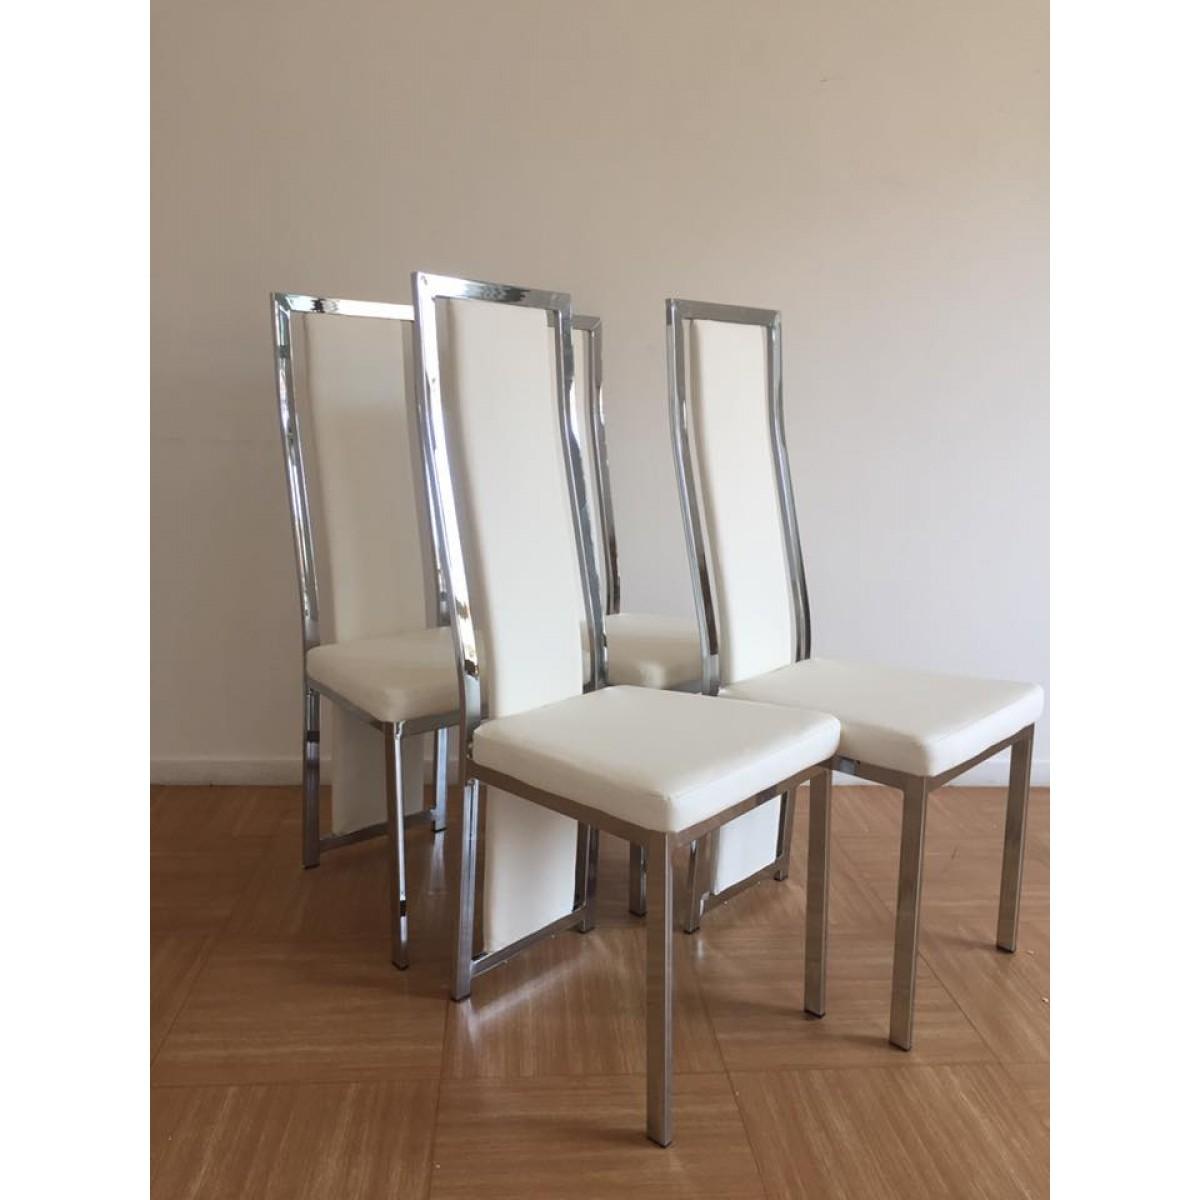 Salle A Manger Gris Blanc Noir chaise de salle à manger clara simili-cuir (noir, blanc